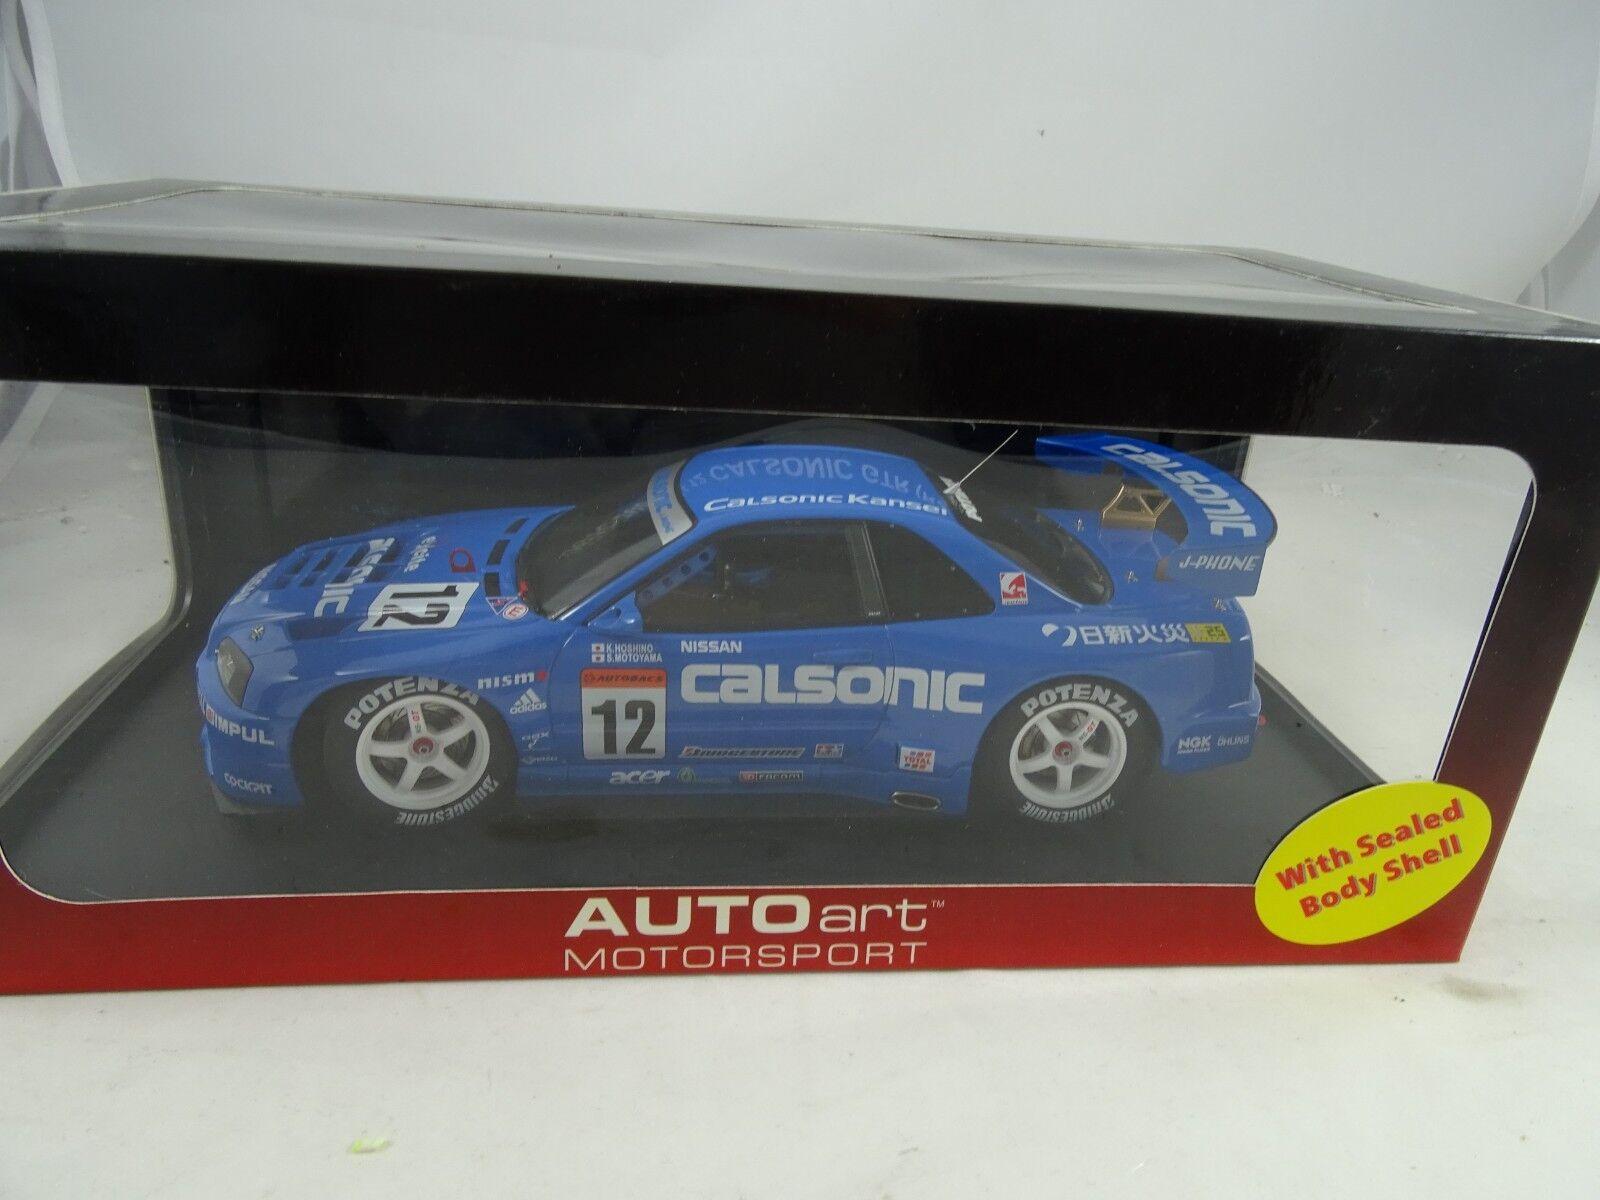 1:18 Autoart  80176 Nissan Skyline R34 Jgtc 2001 Calsonic  12 Blu - Rarità